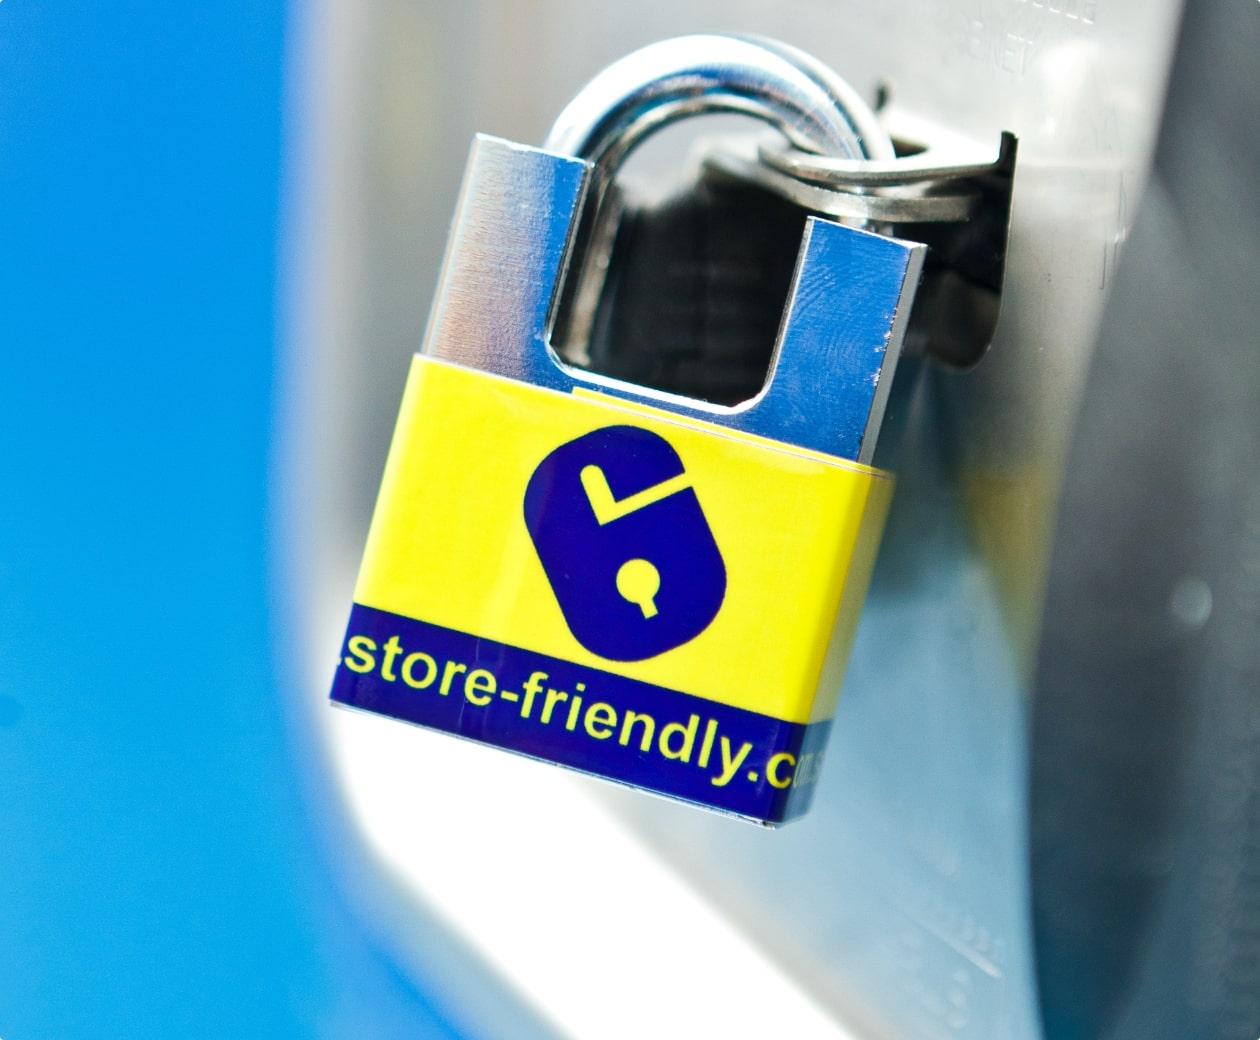 A storefriendly padlock